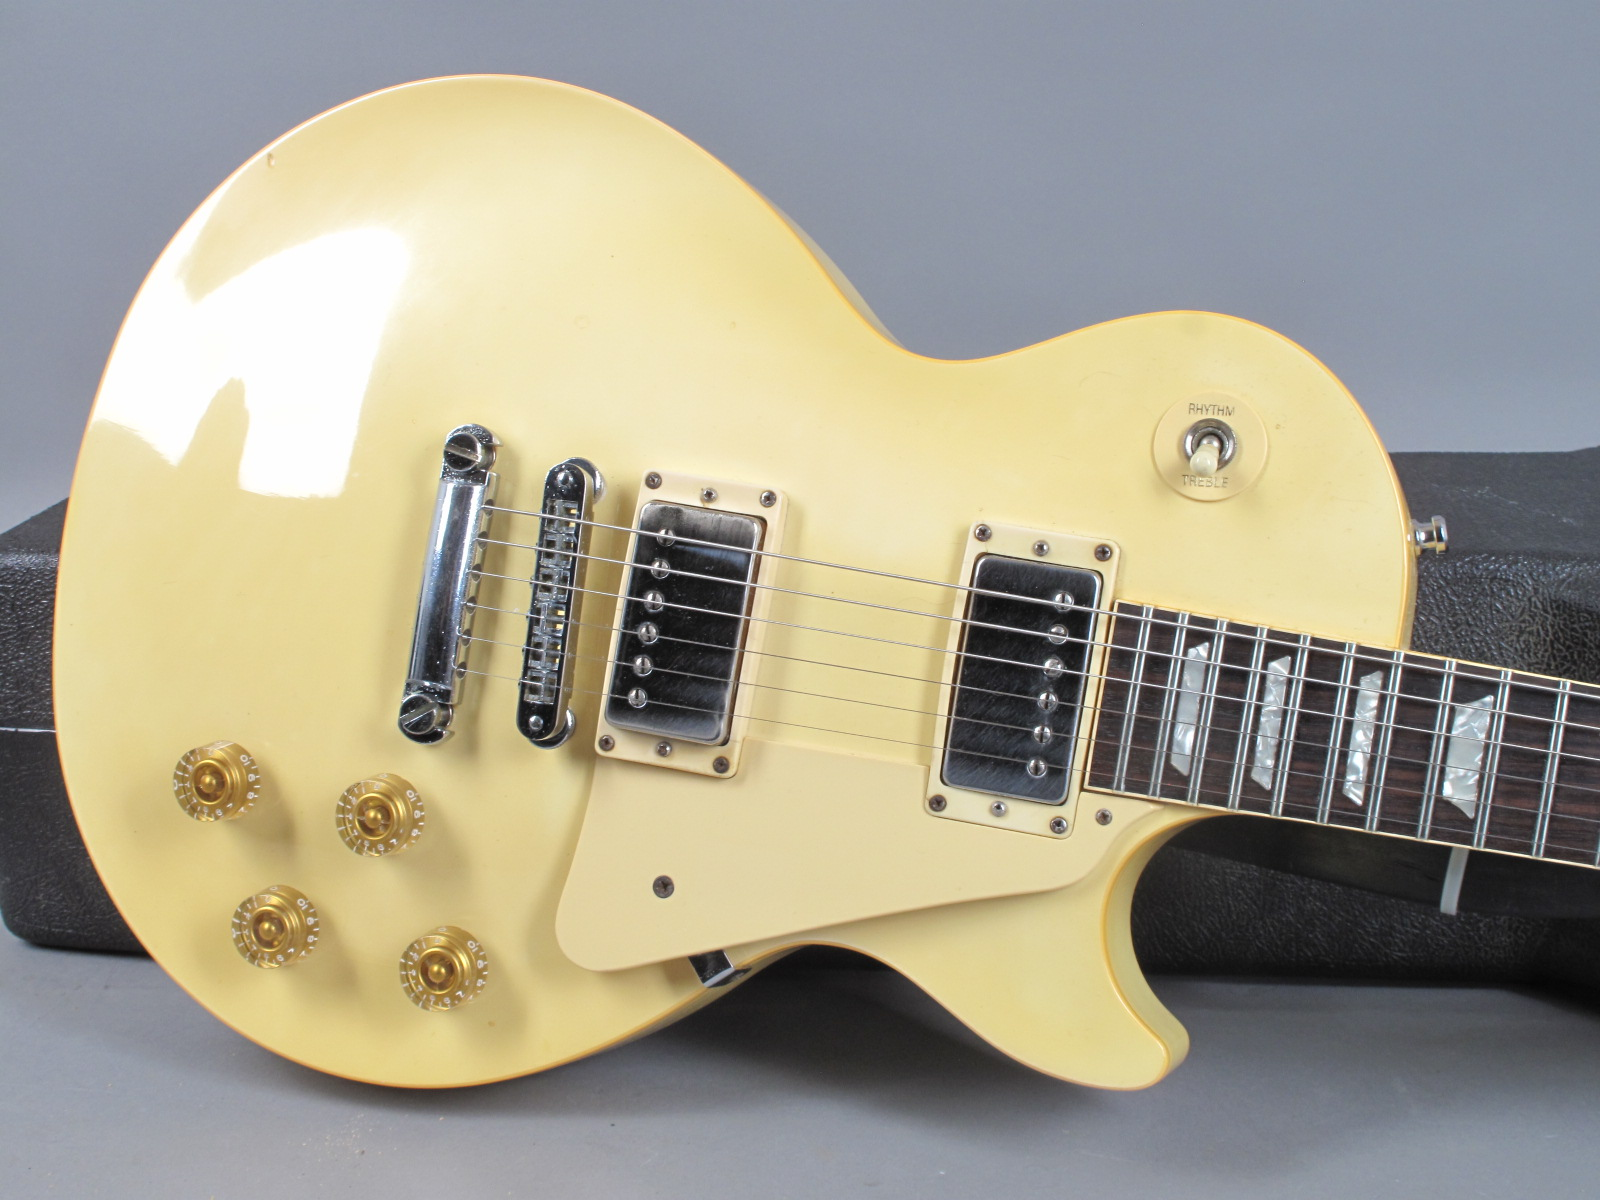 https://guitarpoint.de/app/uploads/products/1985-gibson-les-paul-standard-white/1985-Gibson-Les-Paul-Standard-White-82275532-11.jpg